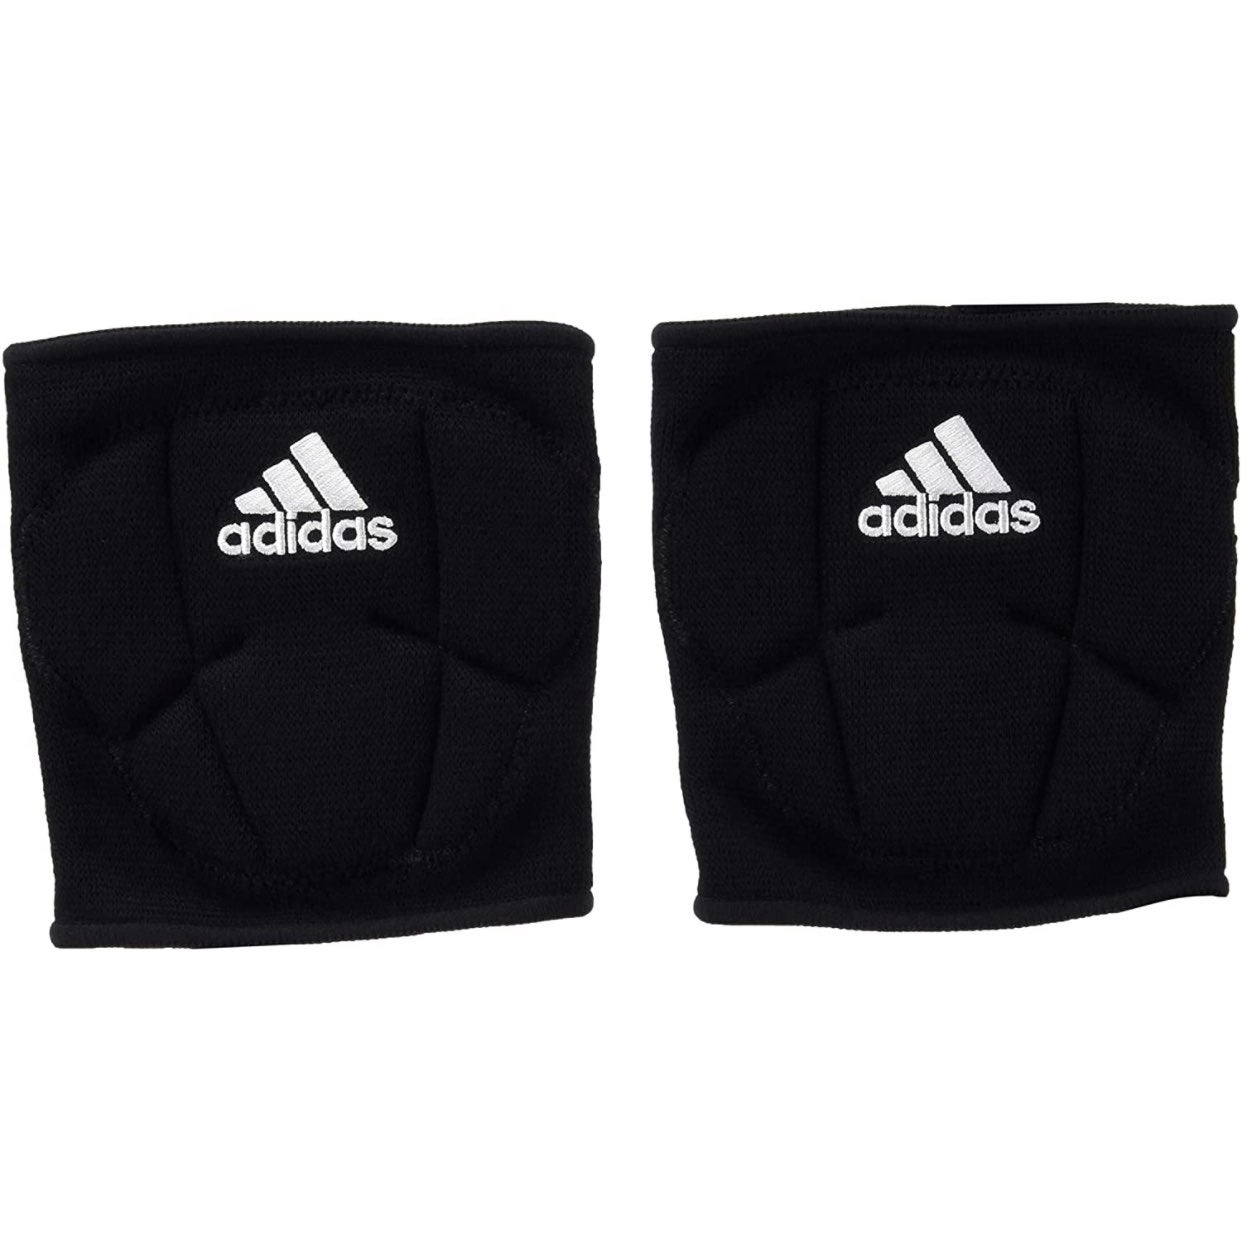 Adidas Volleyball 5 Inch Kneepads